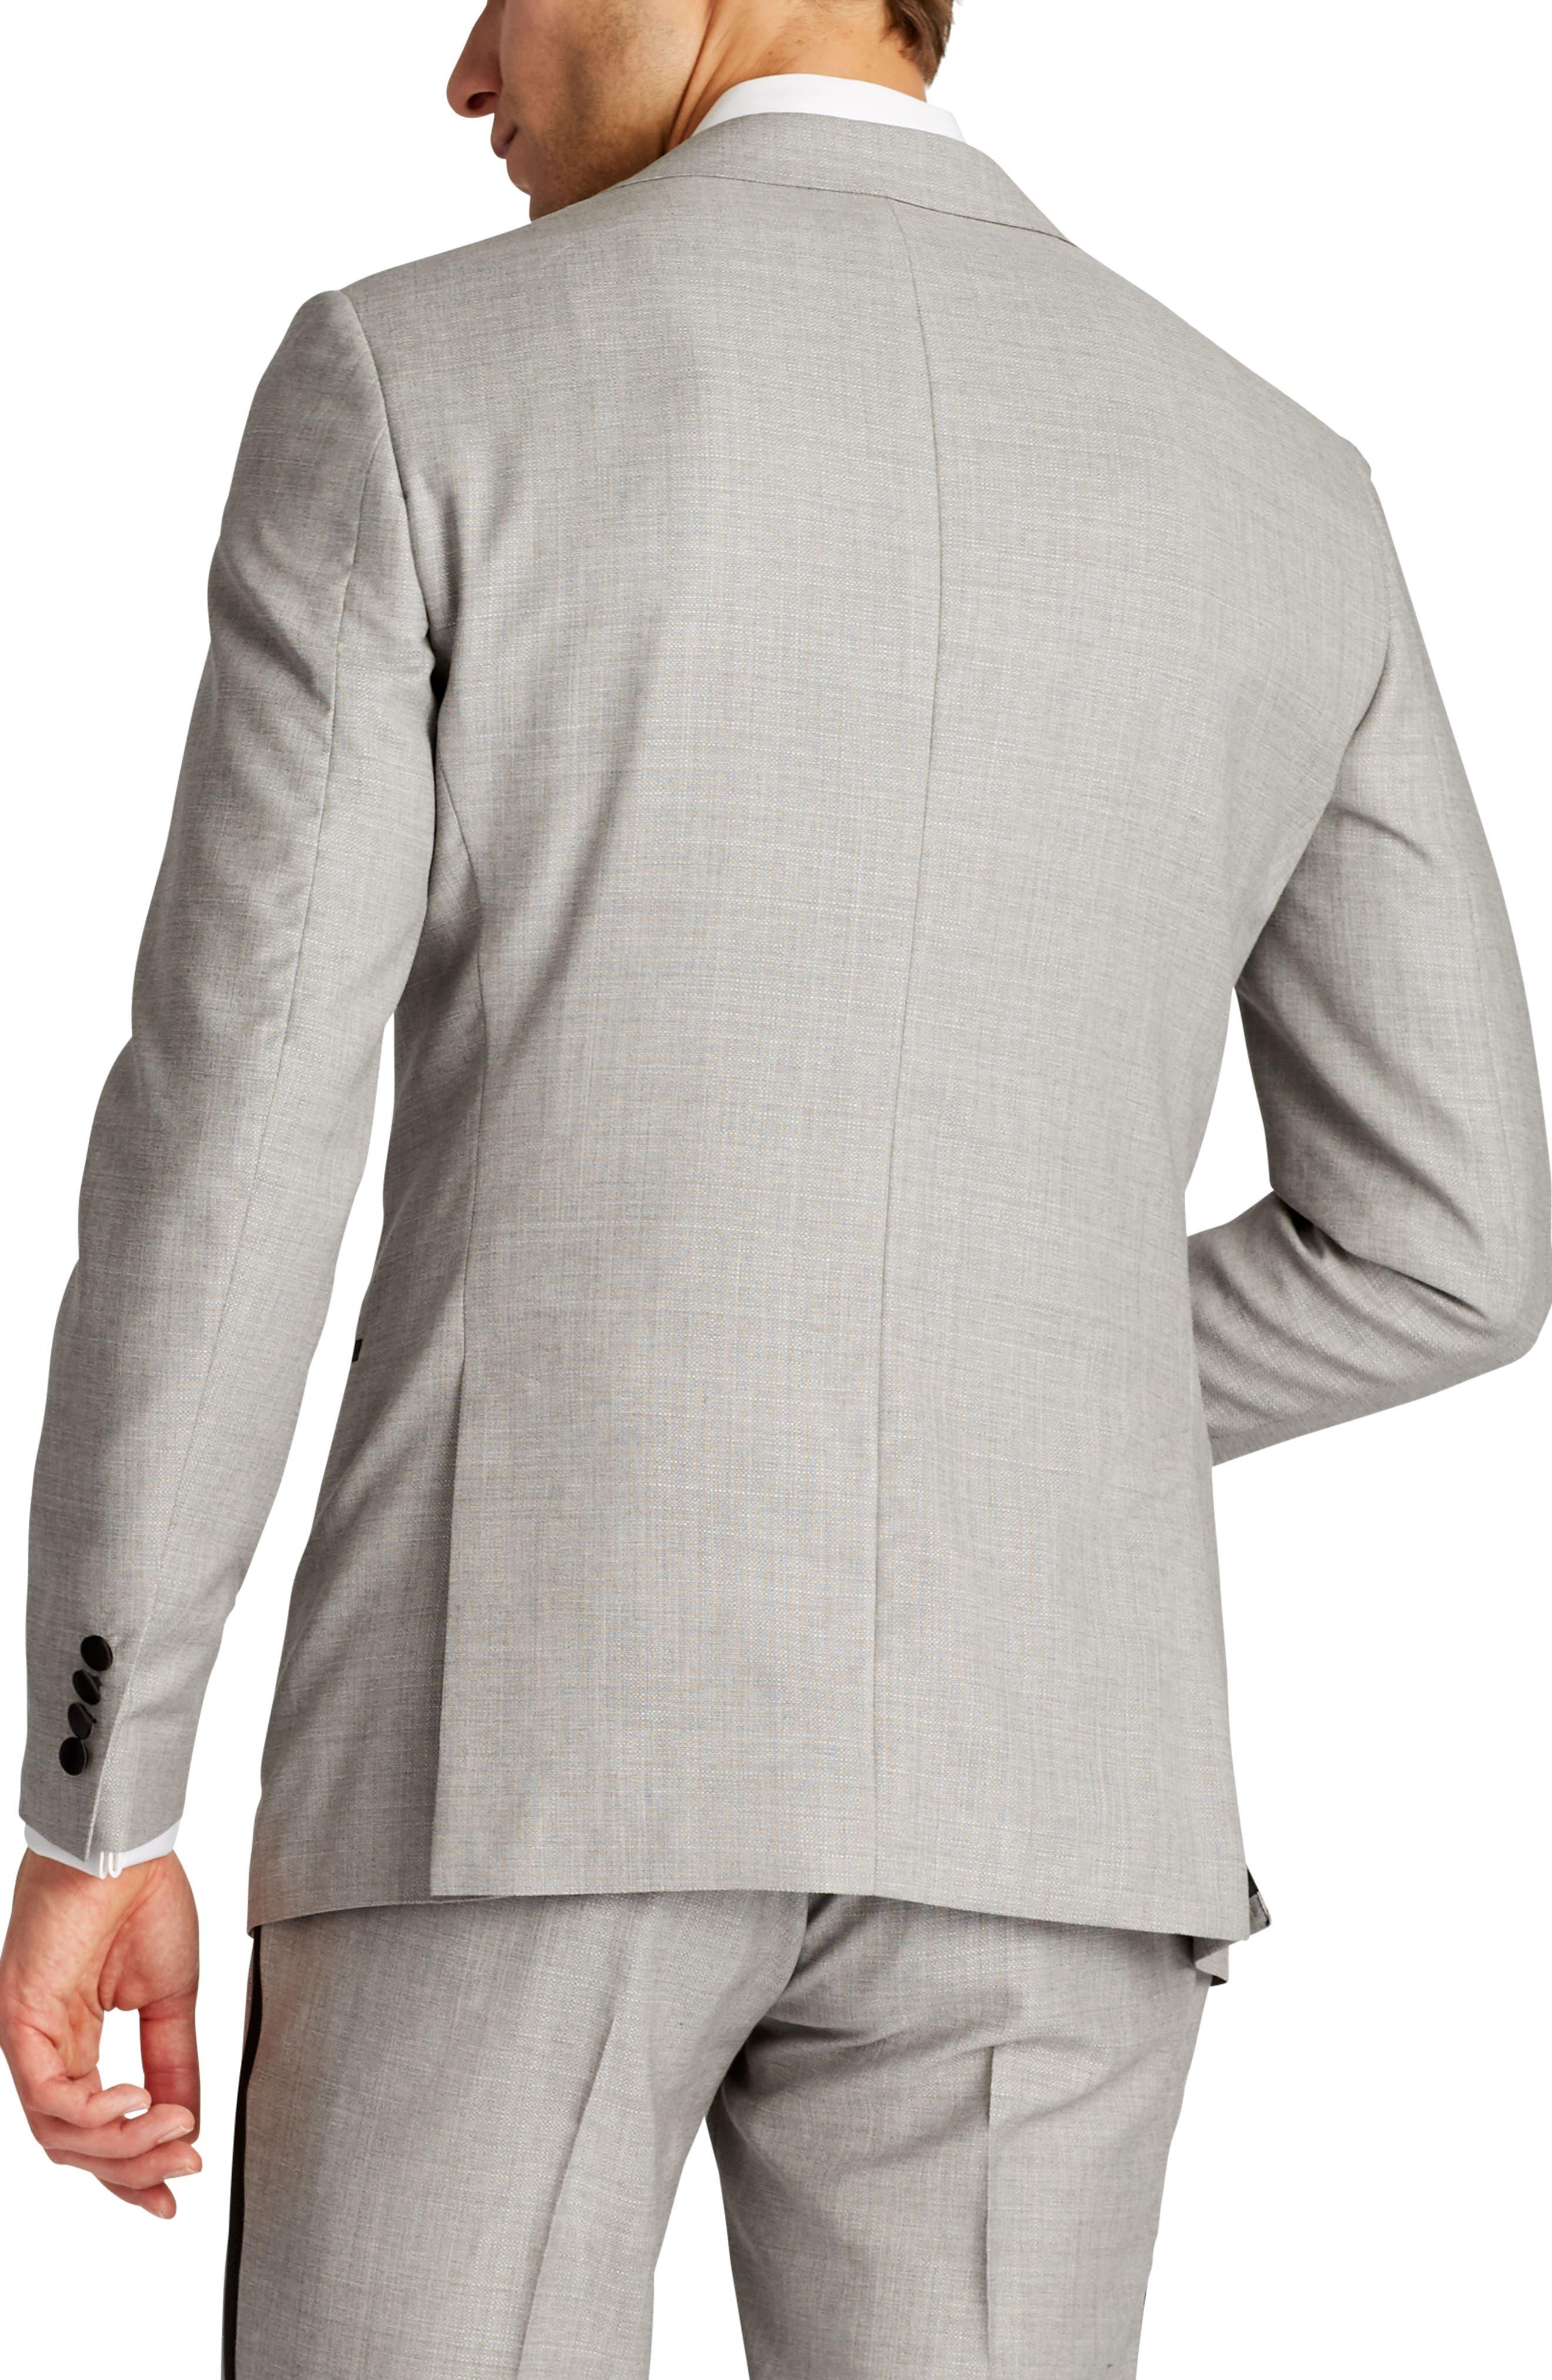 Capstone Slim Fit Wool Dinner Jacket,                             Alternate thumbnail 2, color,                             020